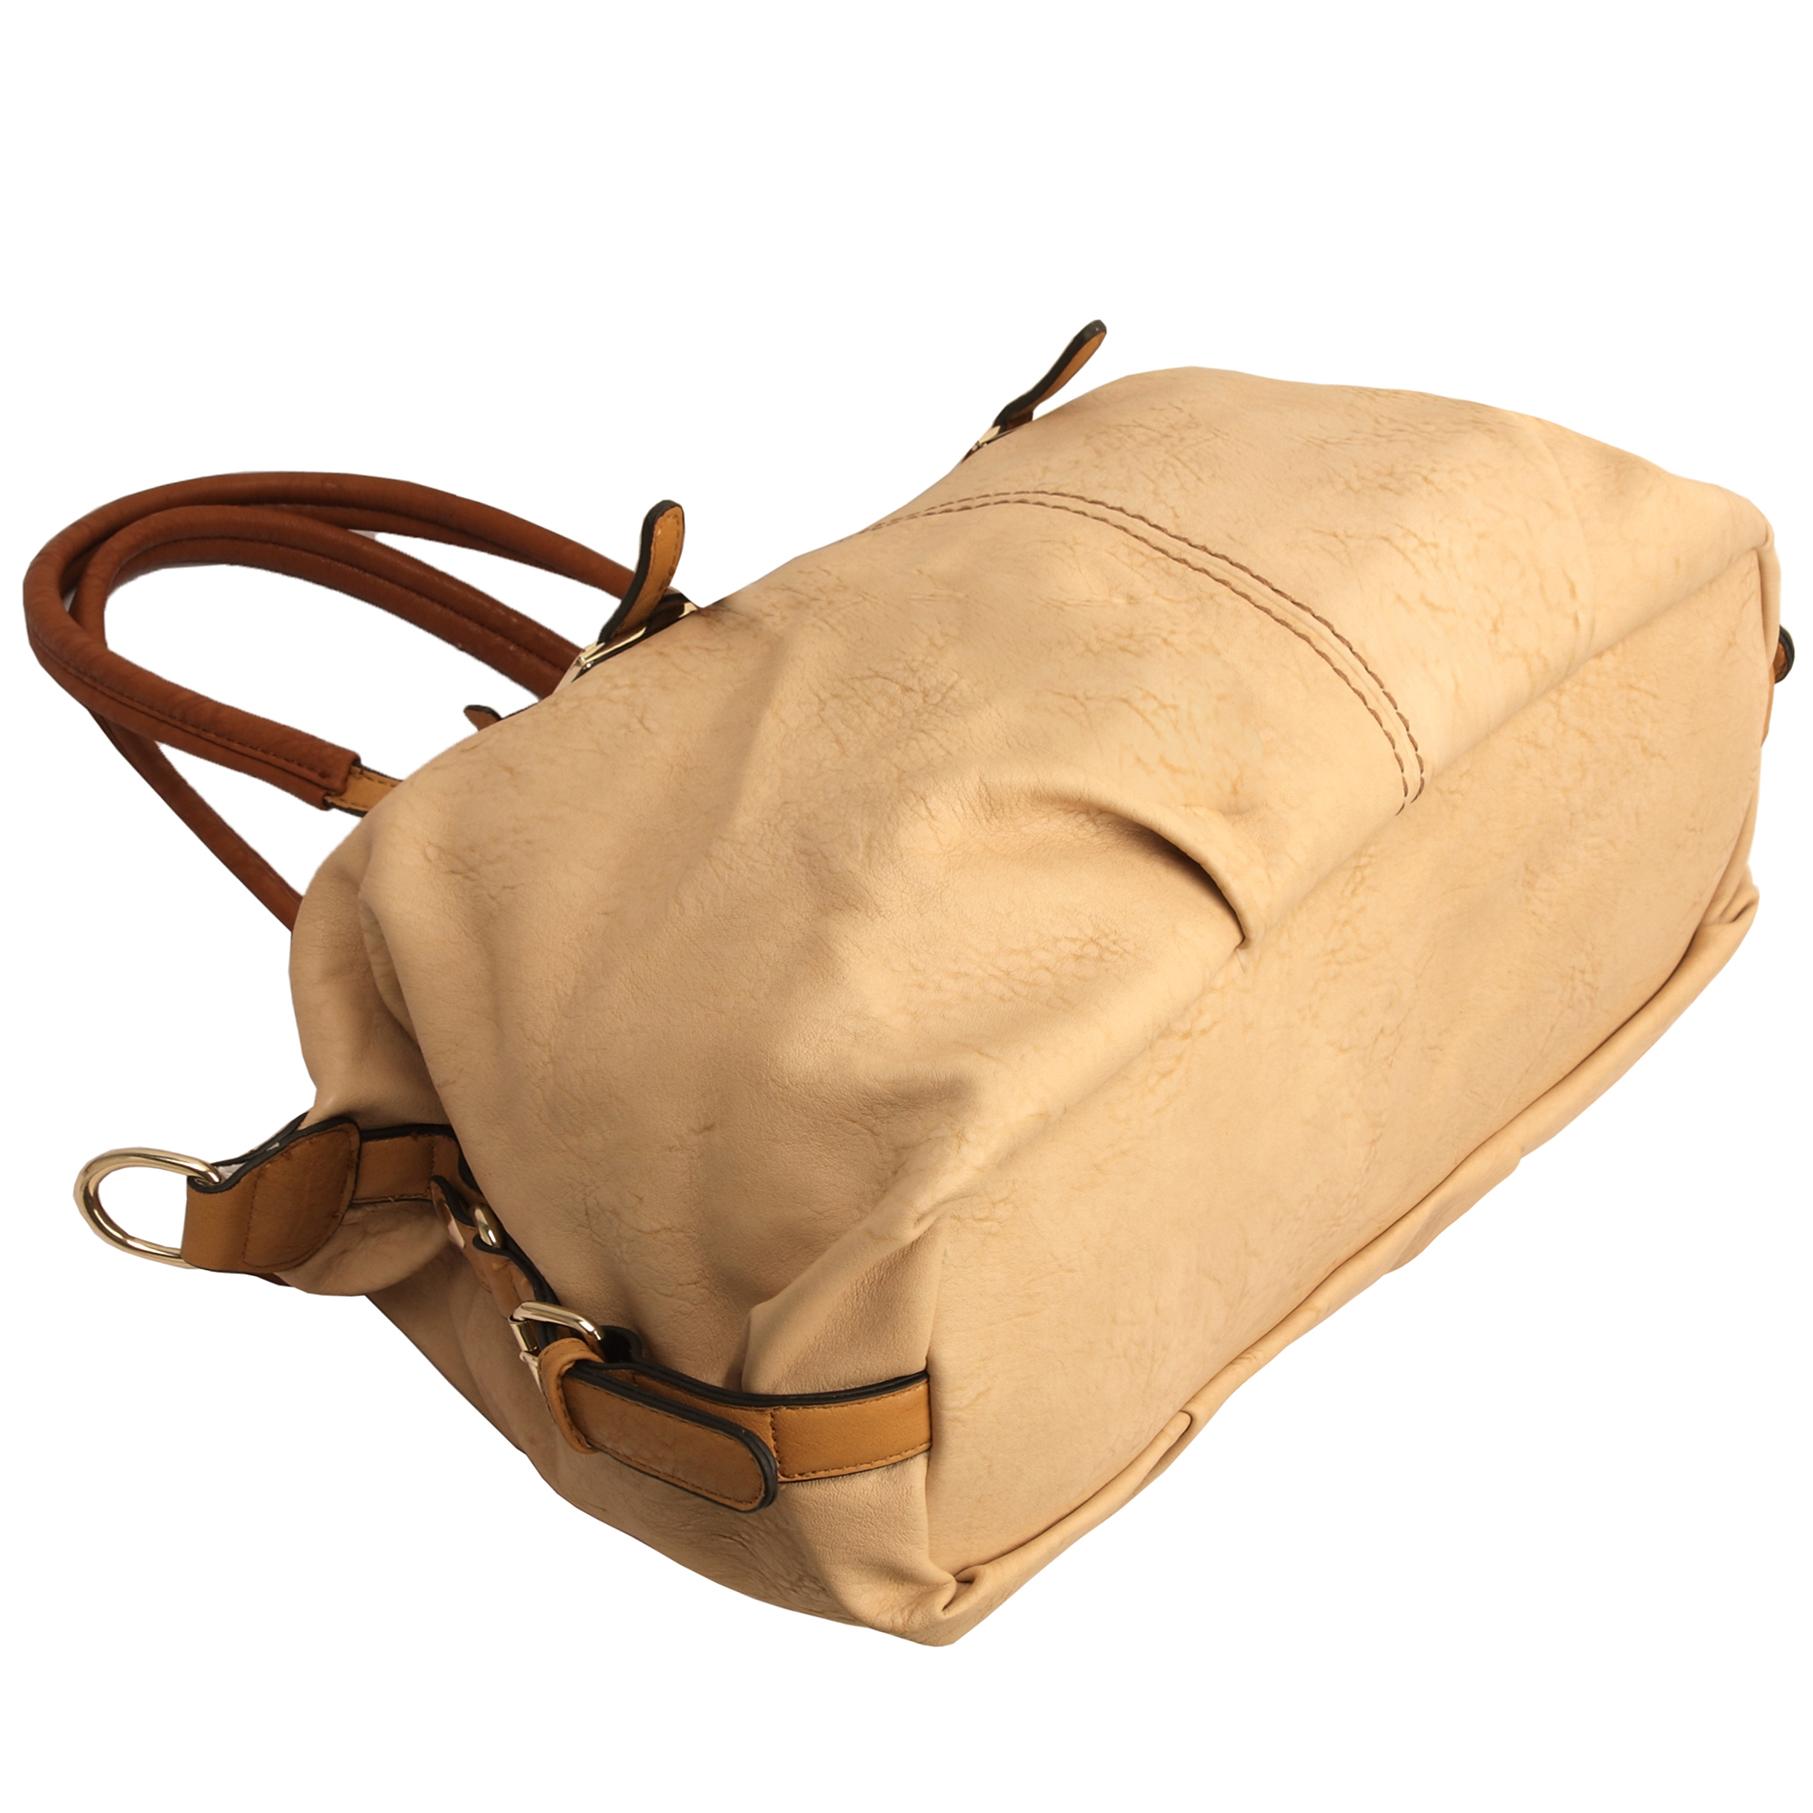 ACACIA Nude Large Everyday Shopper Hobo Handbag Bottom